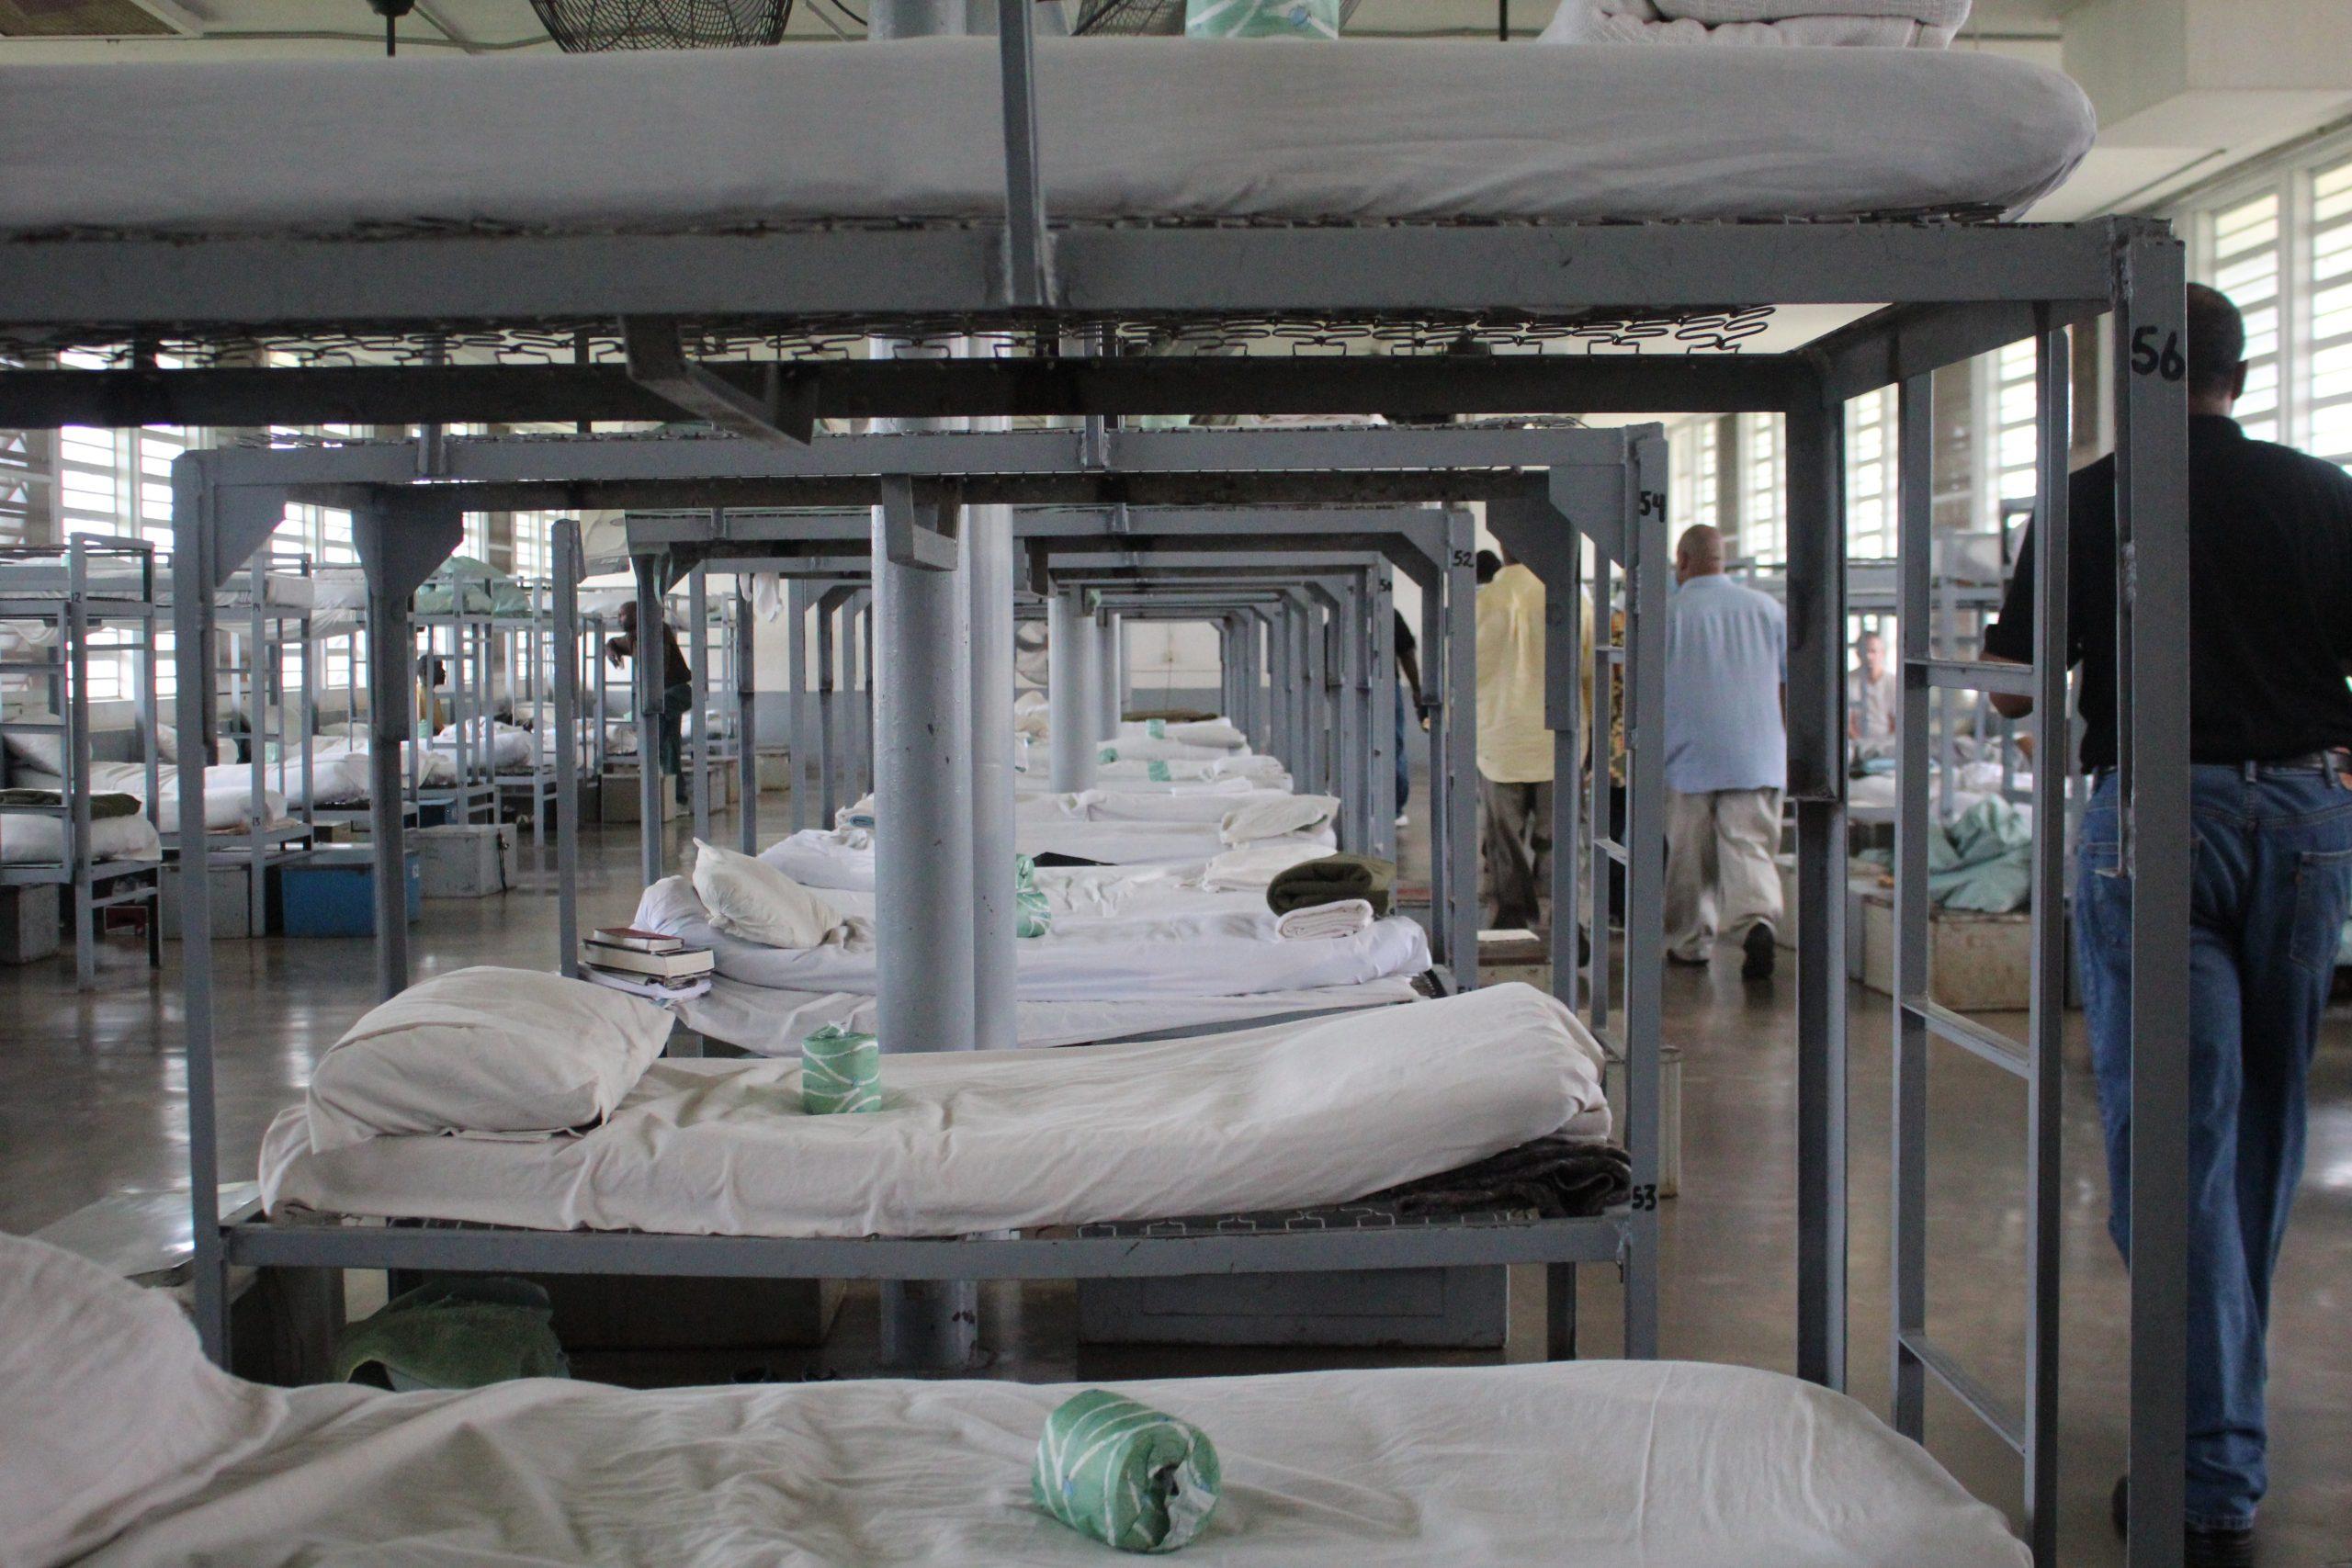 Lawmaker pulls bill to ease parole access for juvenile lifers